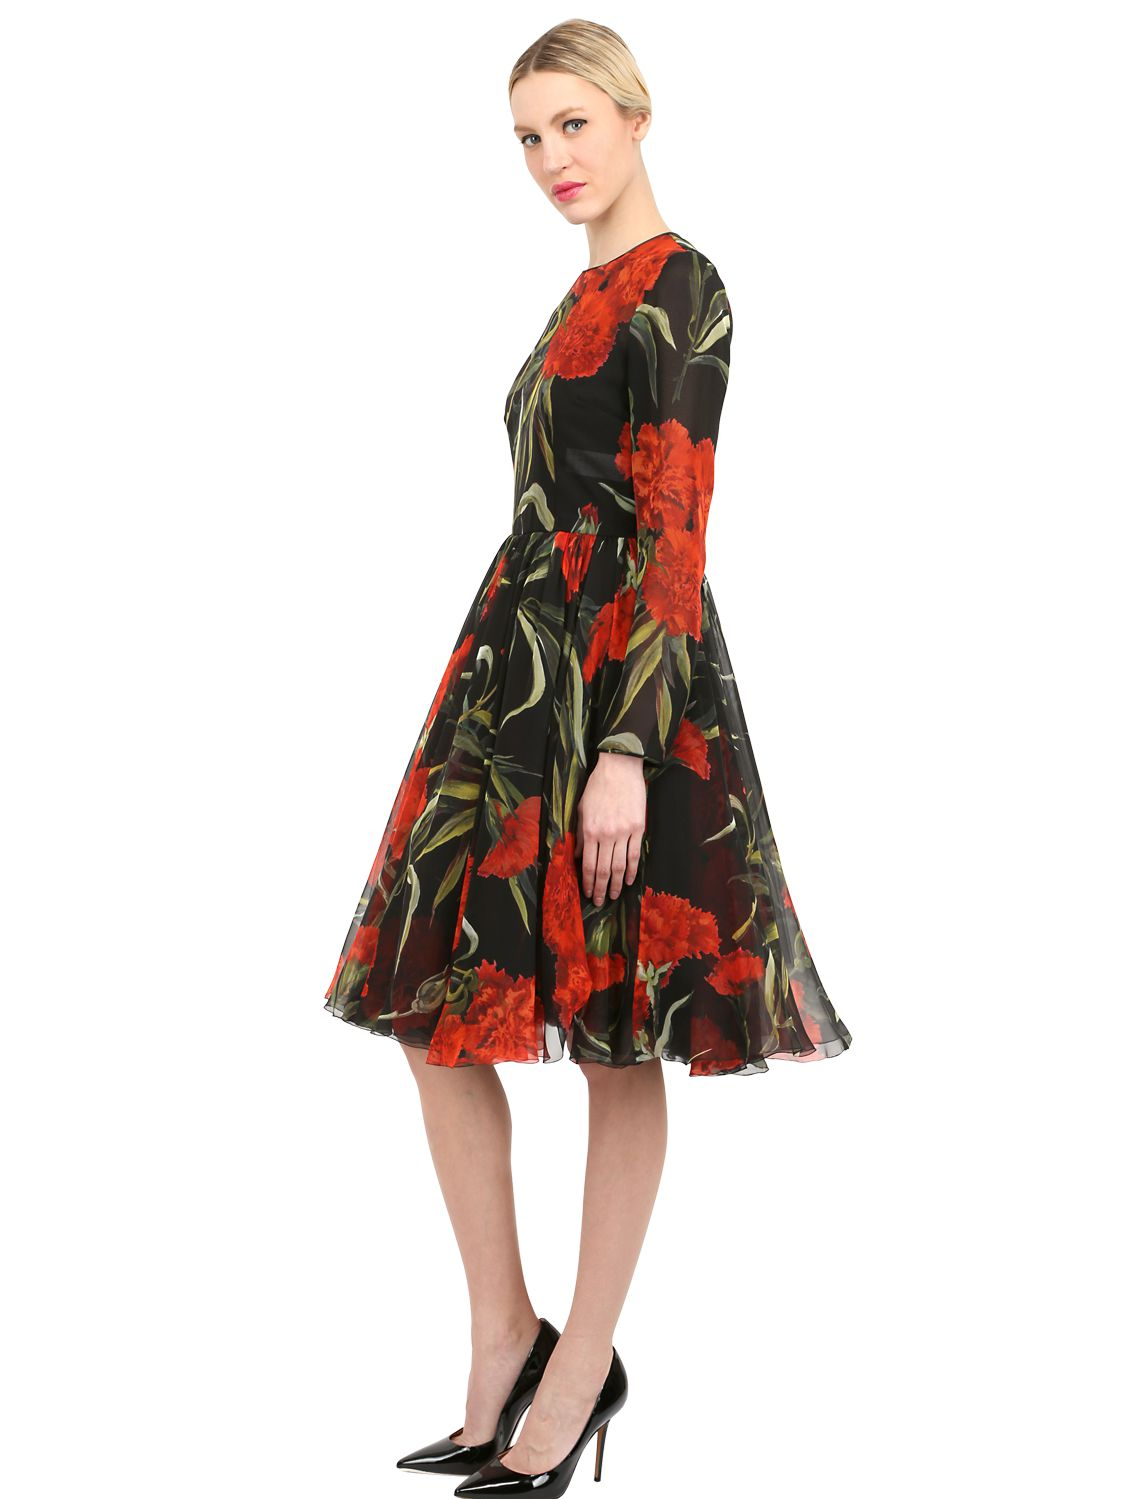 51e125aafb Dolce   Gabbana Floral Printed Silk Chiffon Dress - Lyst